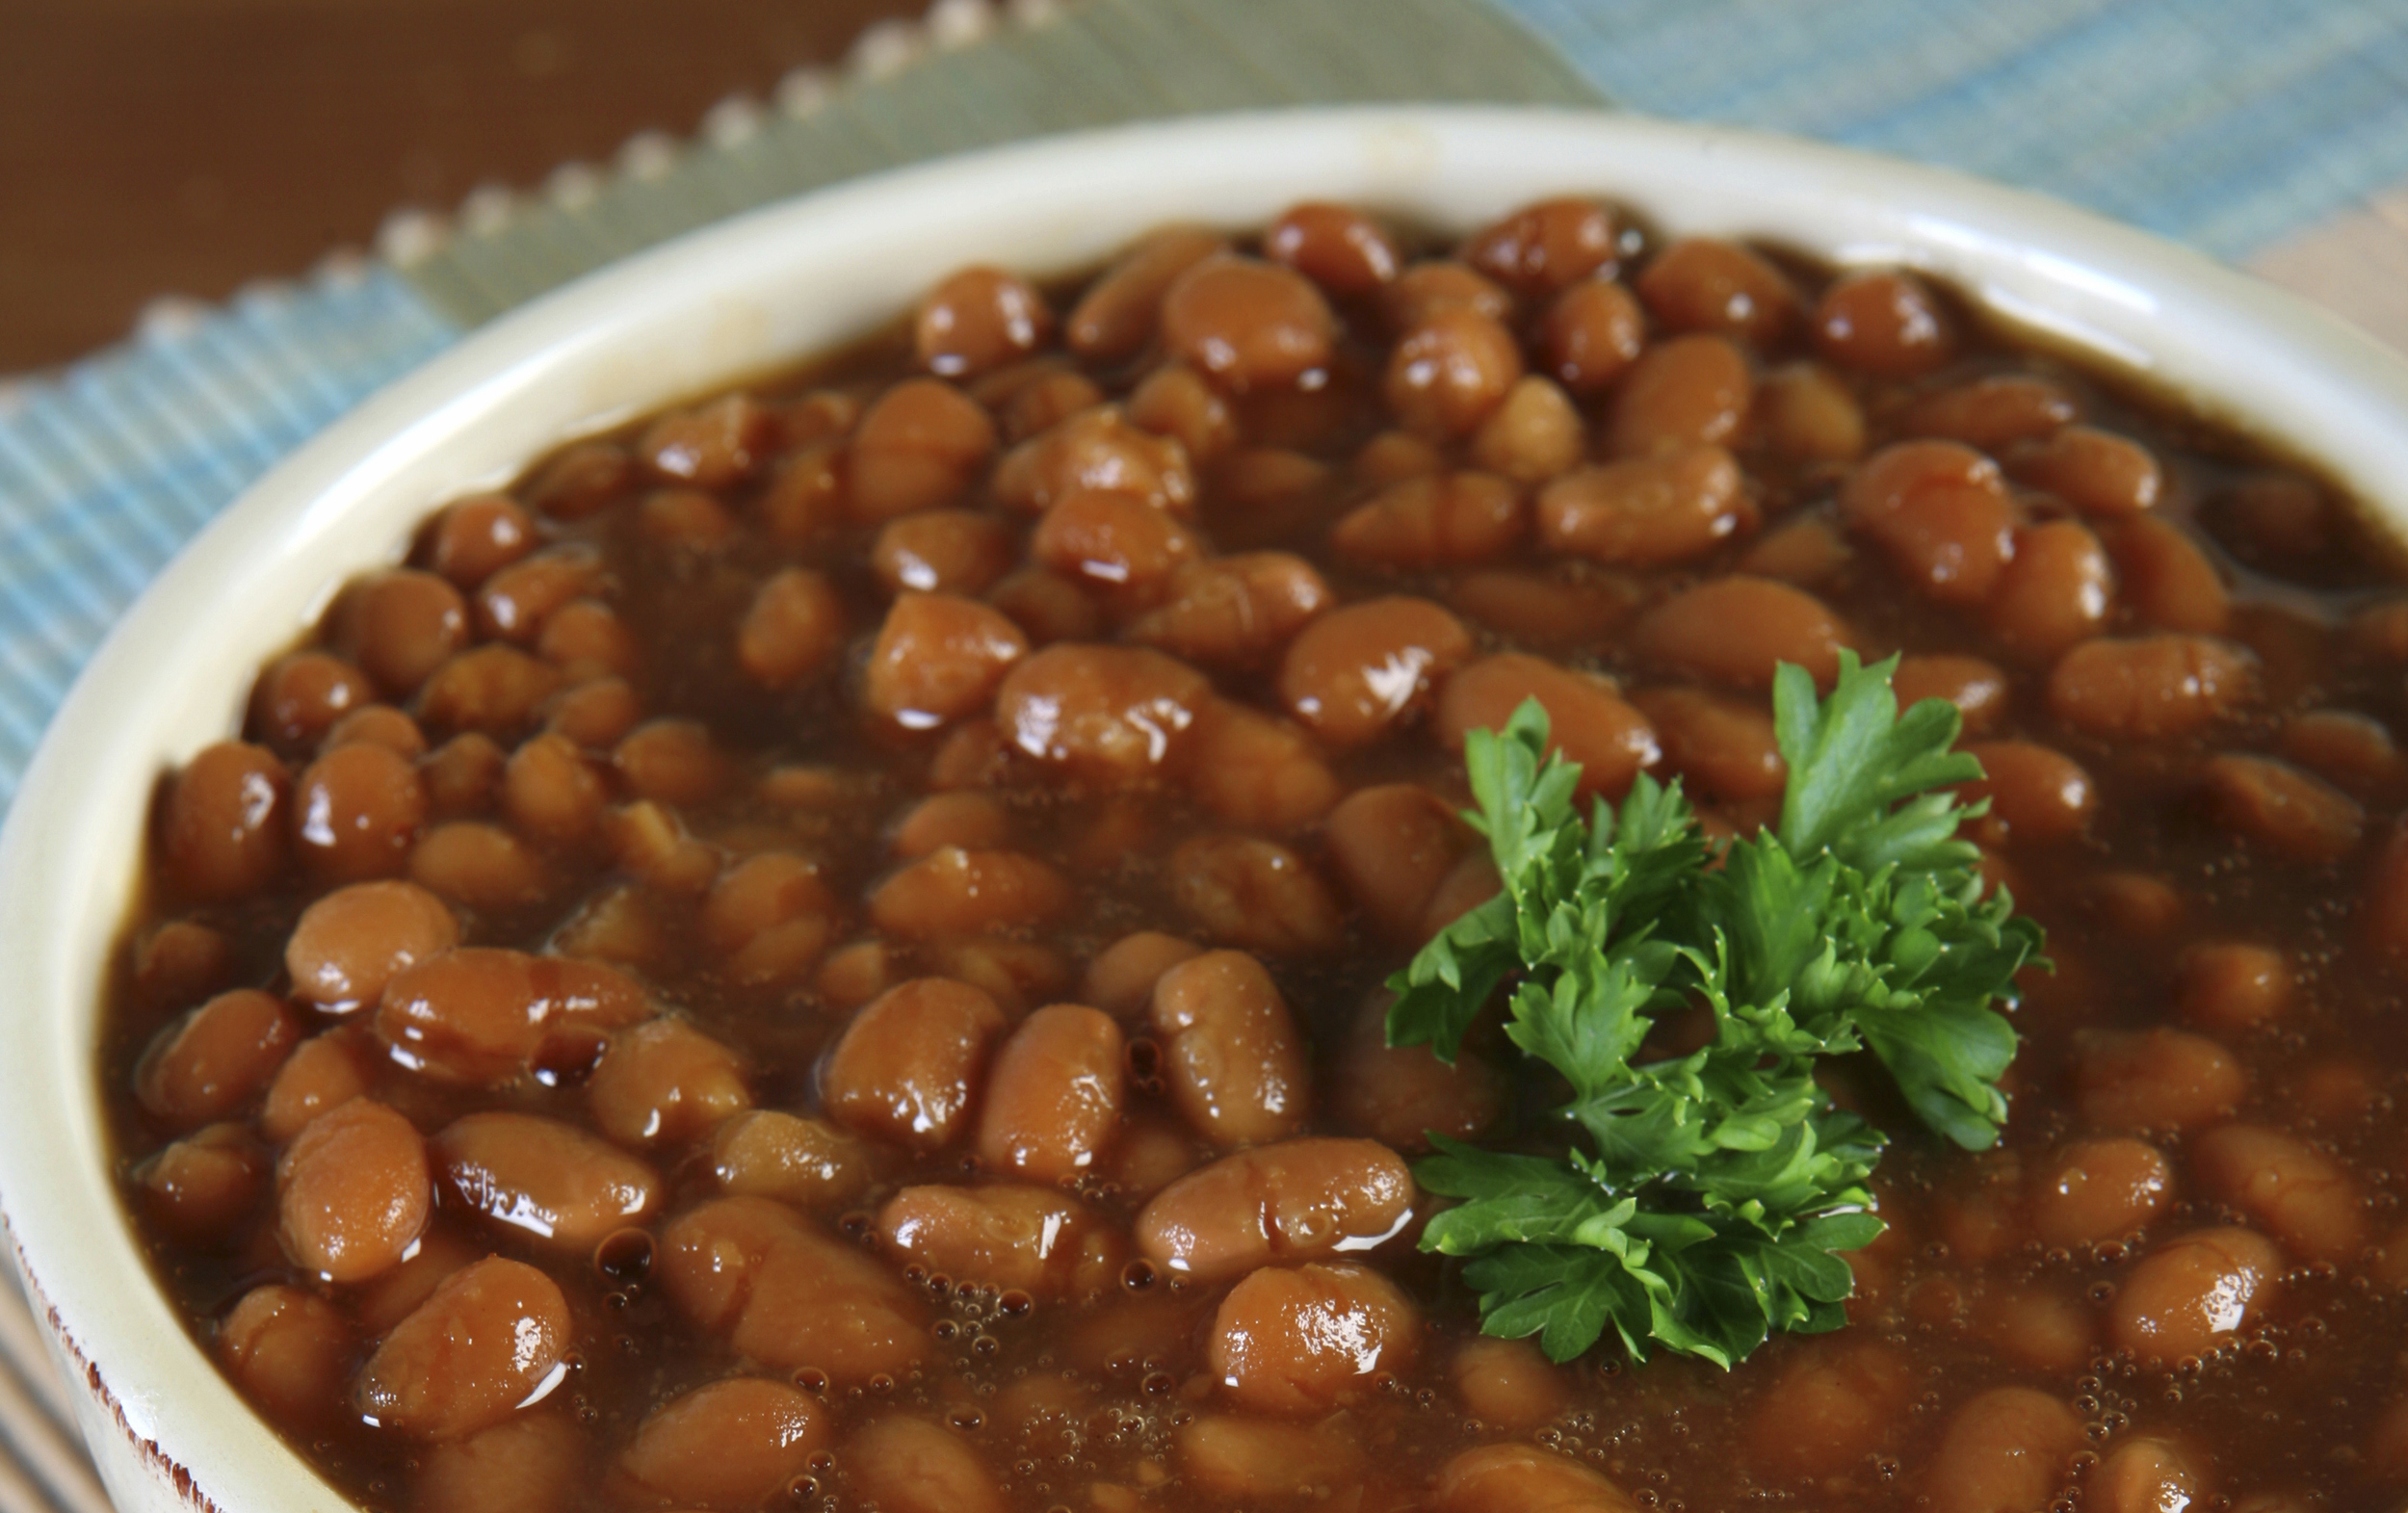 bruna bönor kalorier